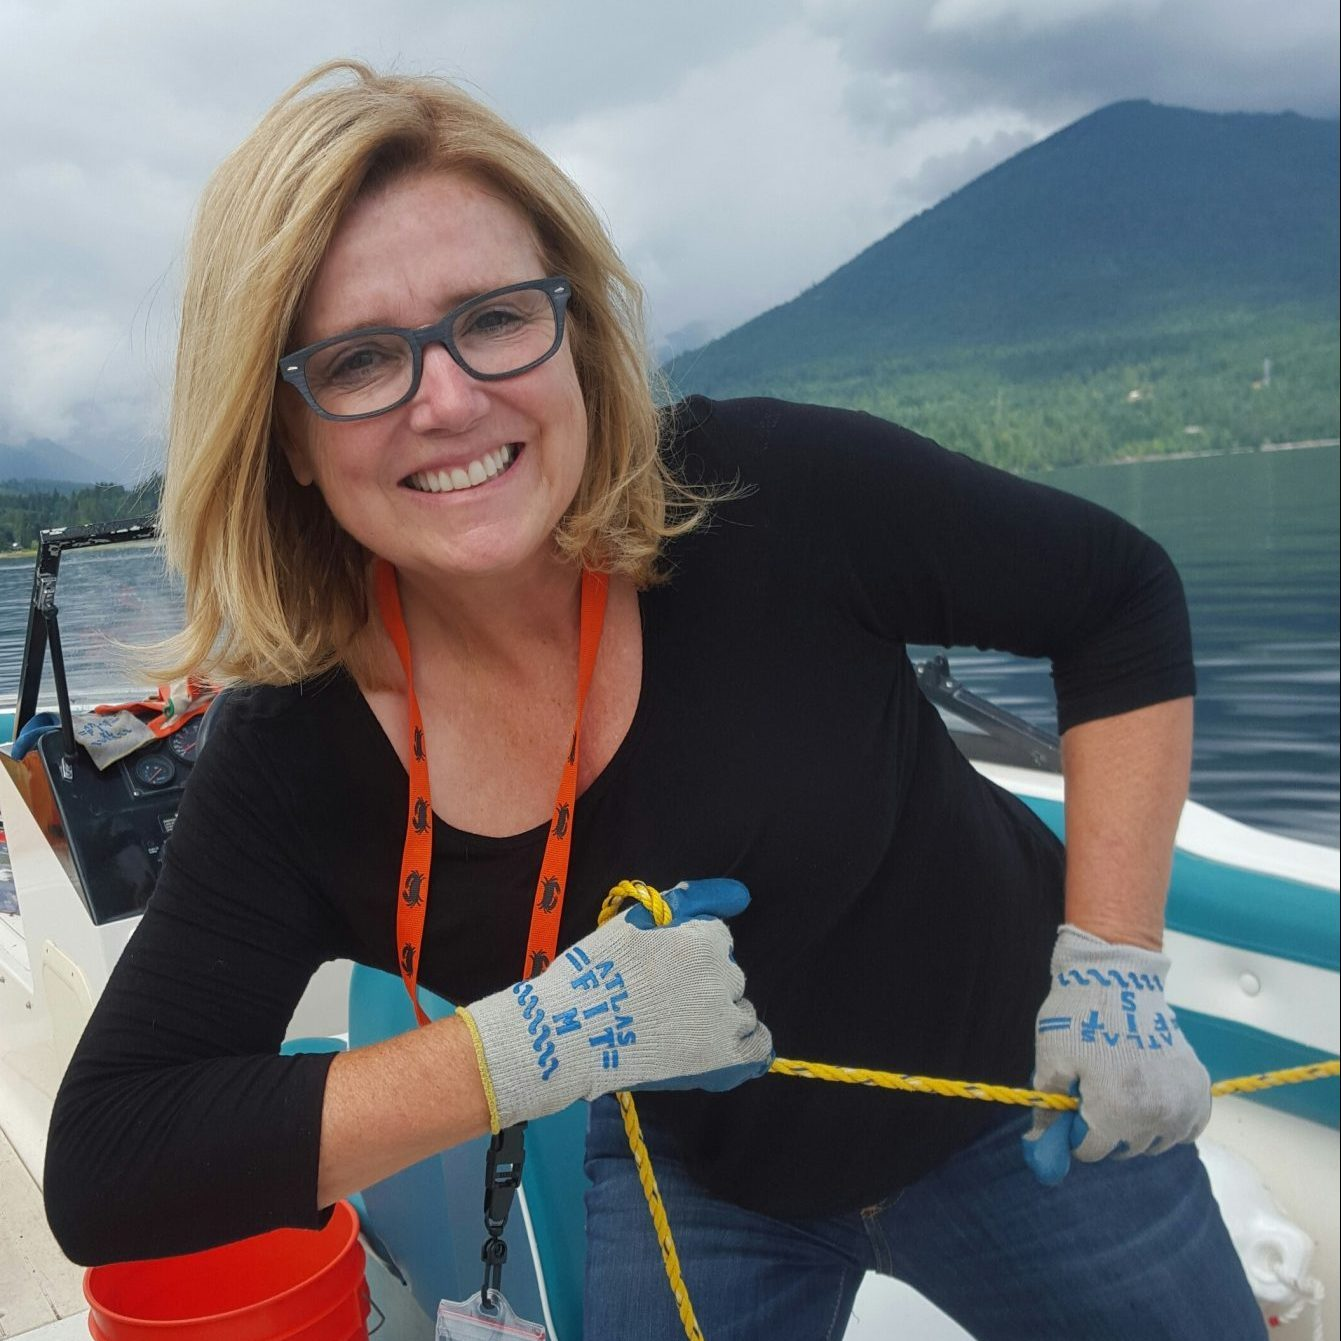 Marie K. Mentor, LLTK Board President